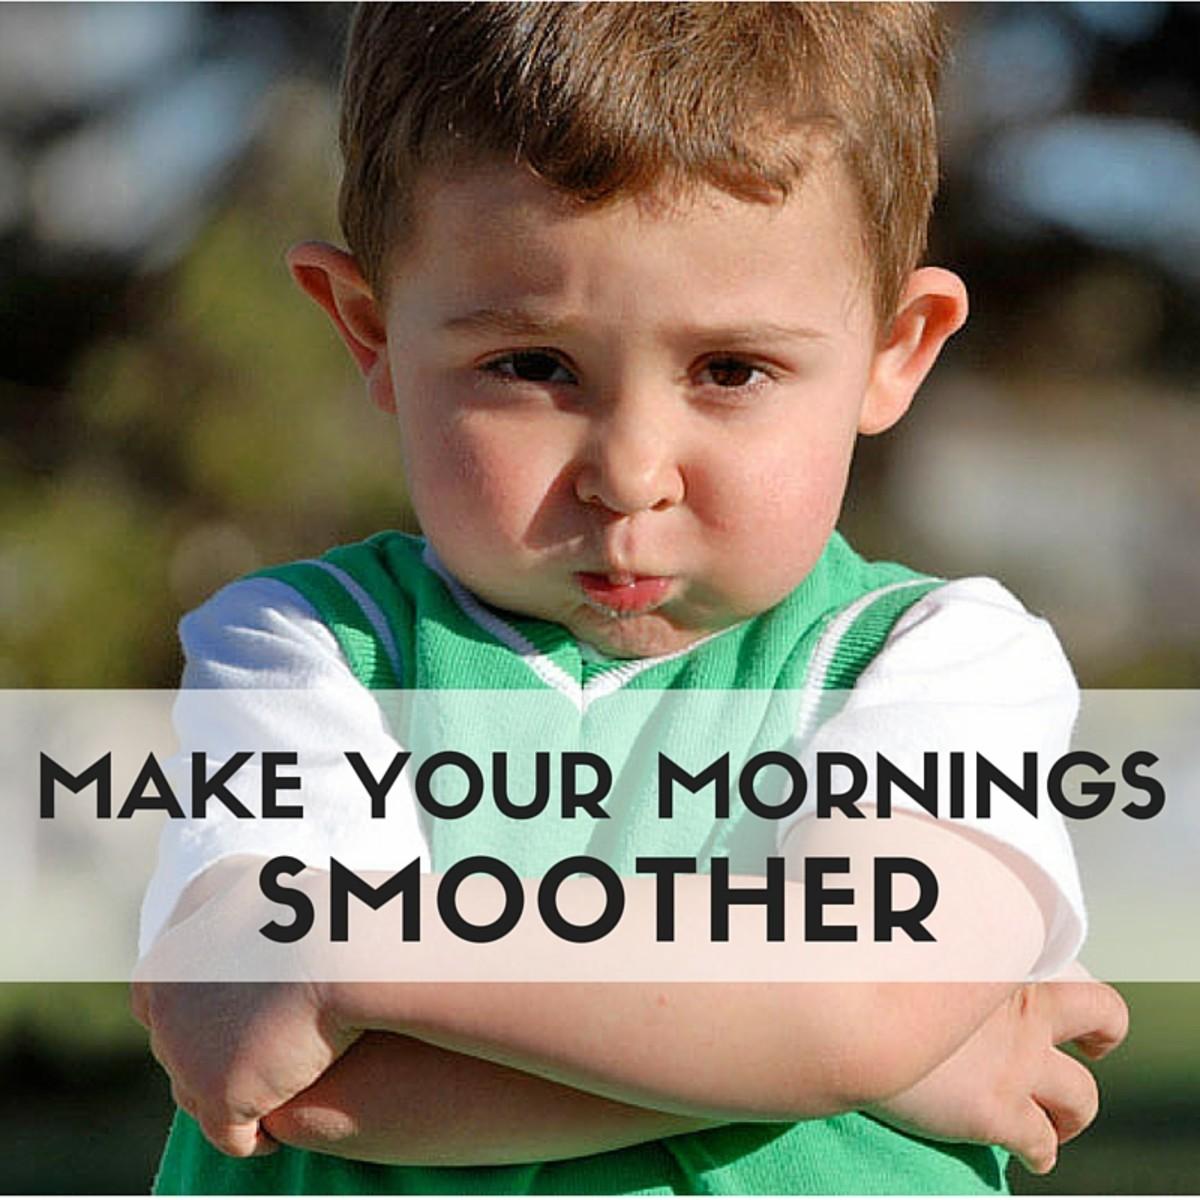 MAKE YOUR MORNINGS